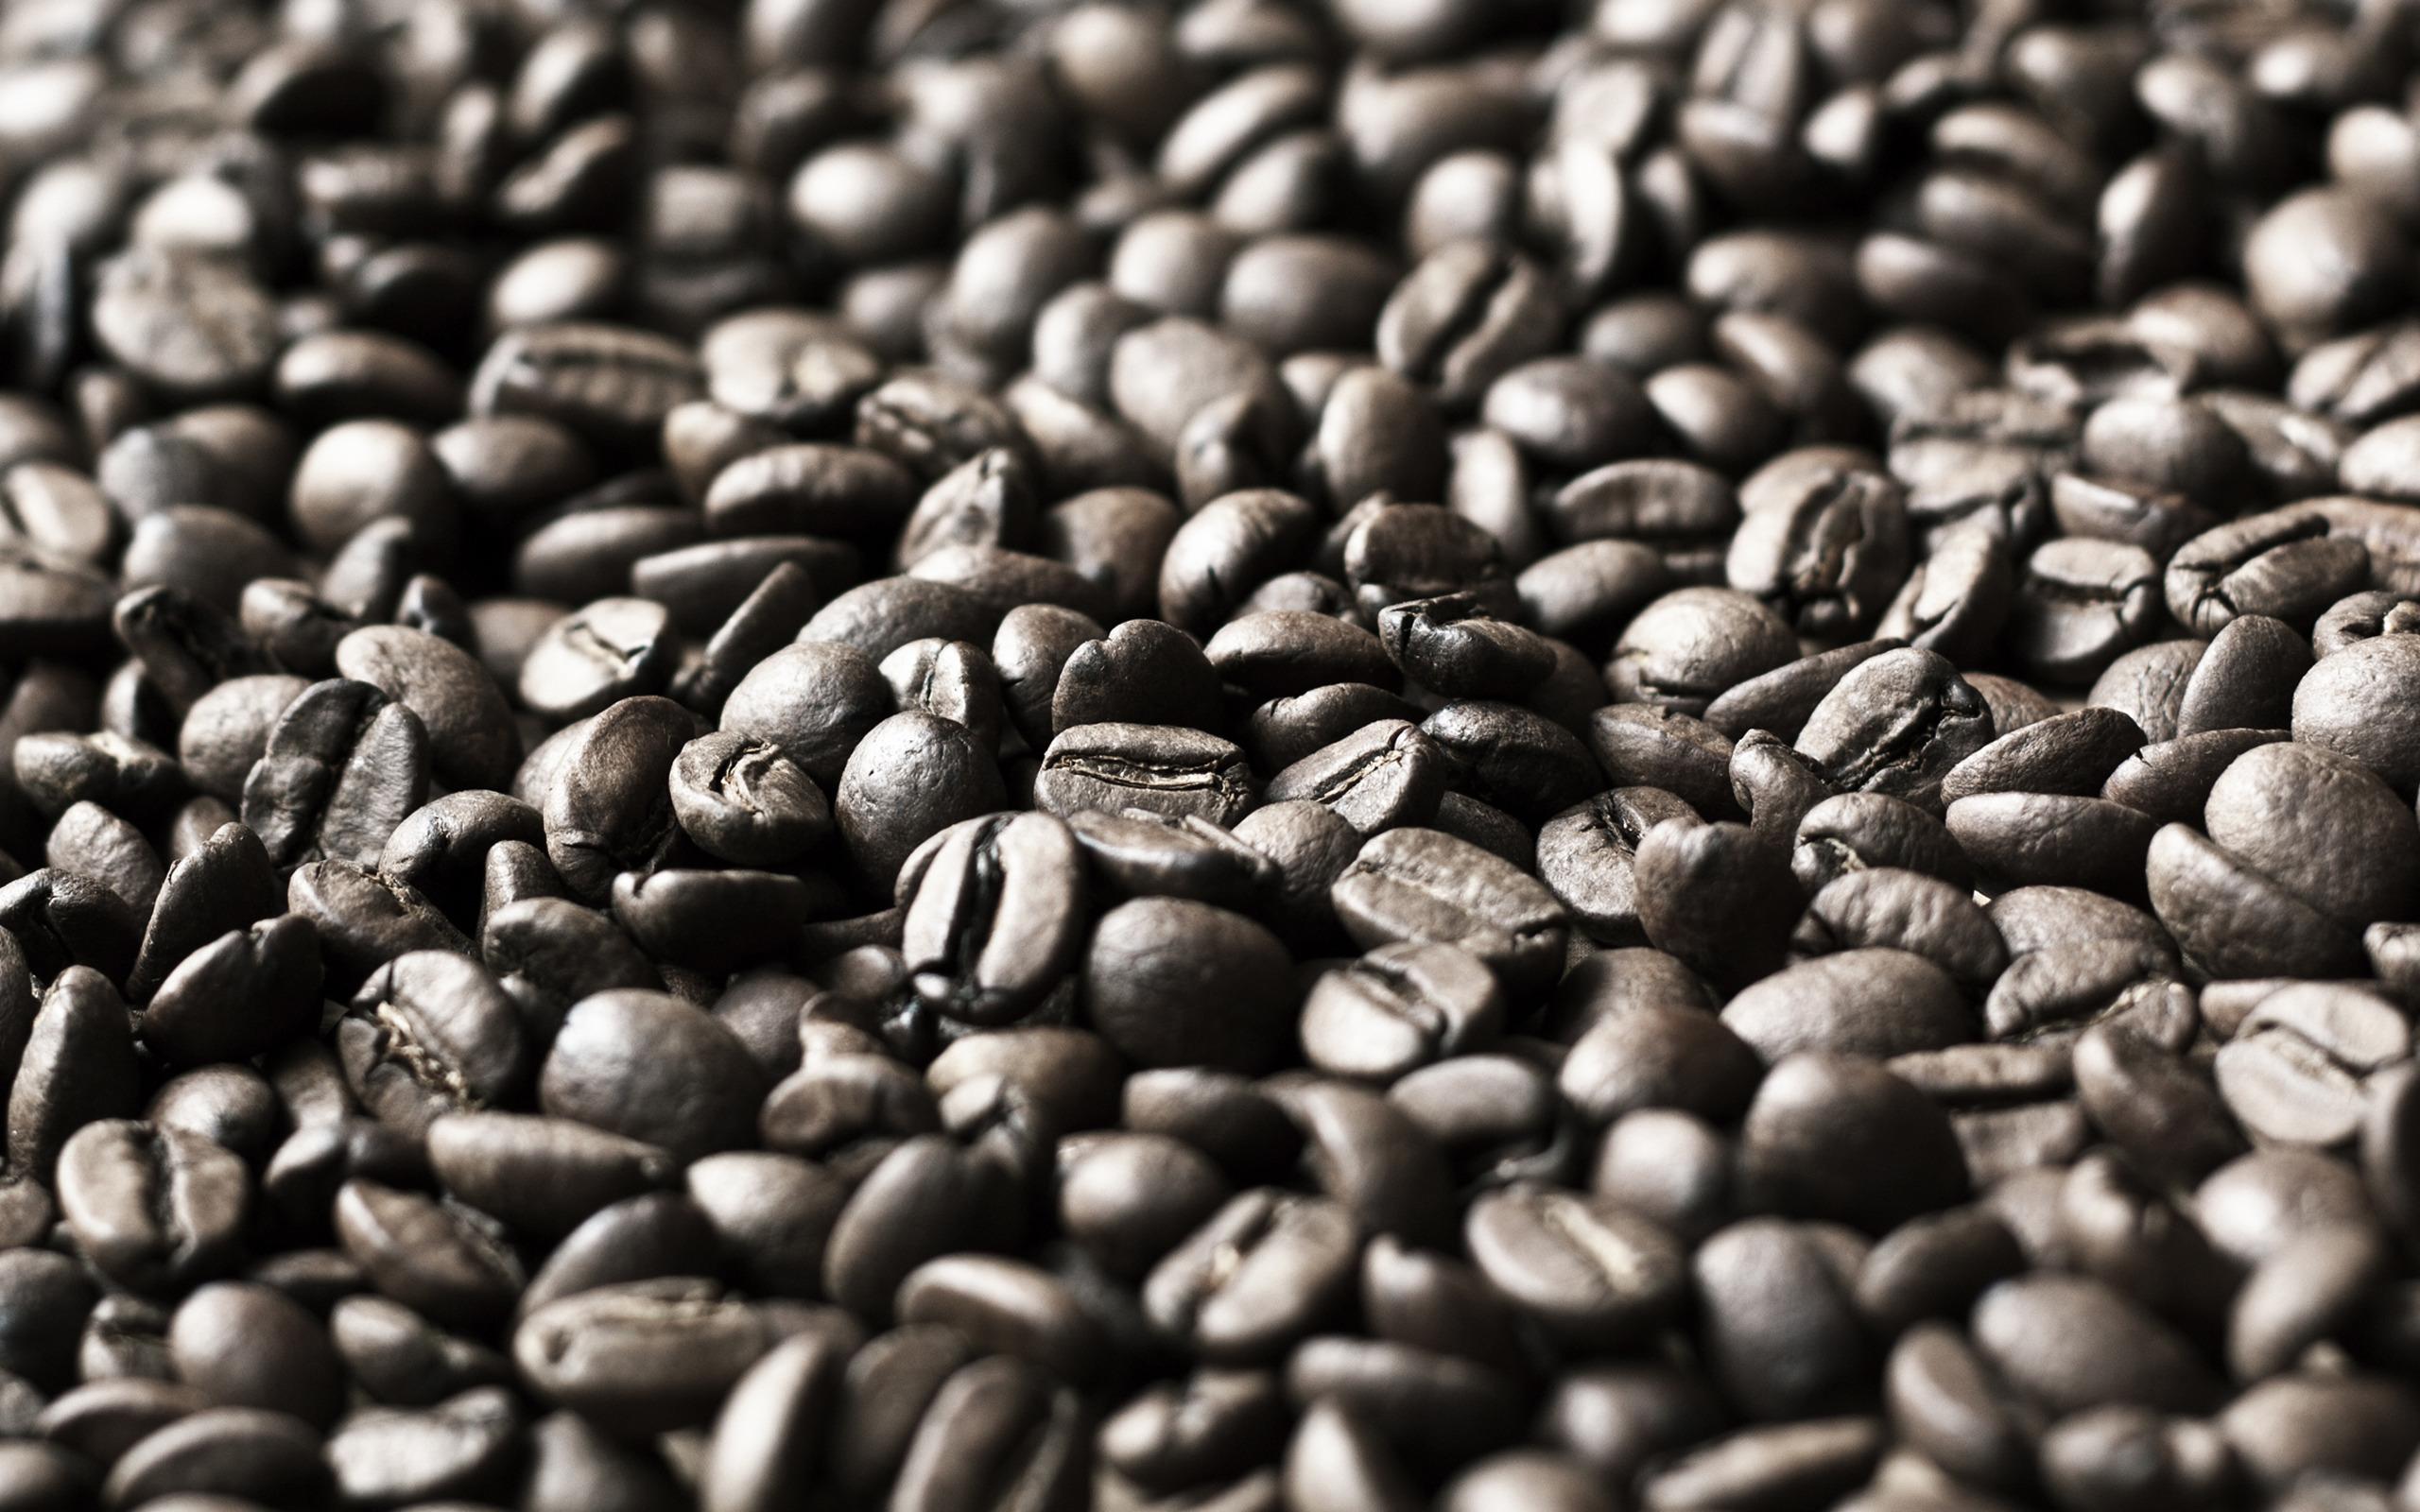 High definition desktop wallpaper of corn photo of coffee background 2560x1600